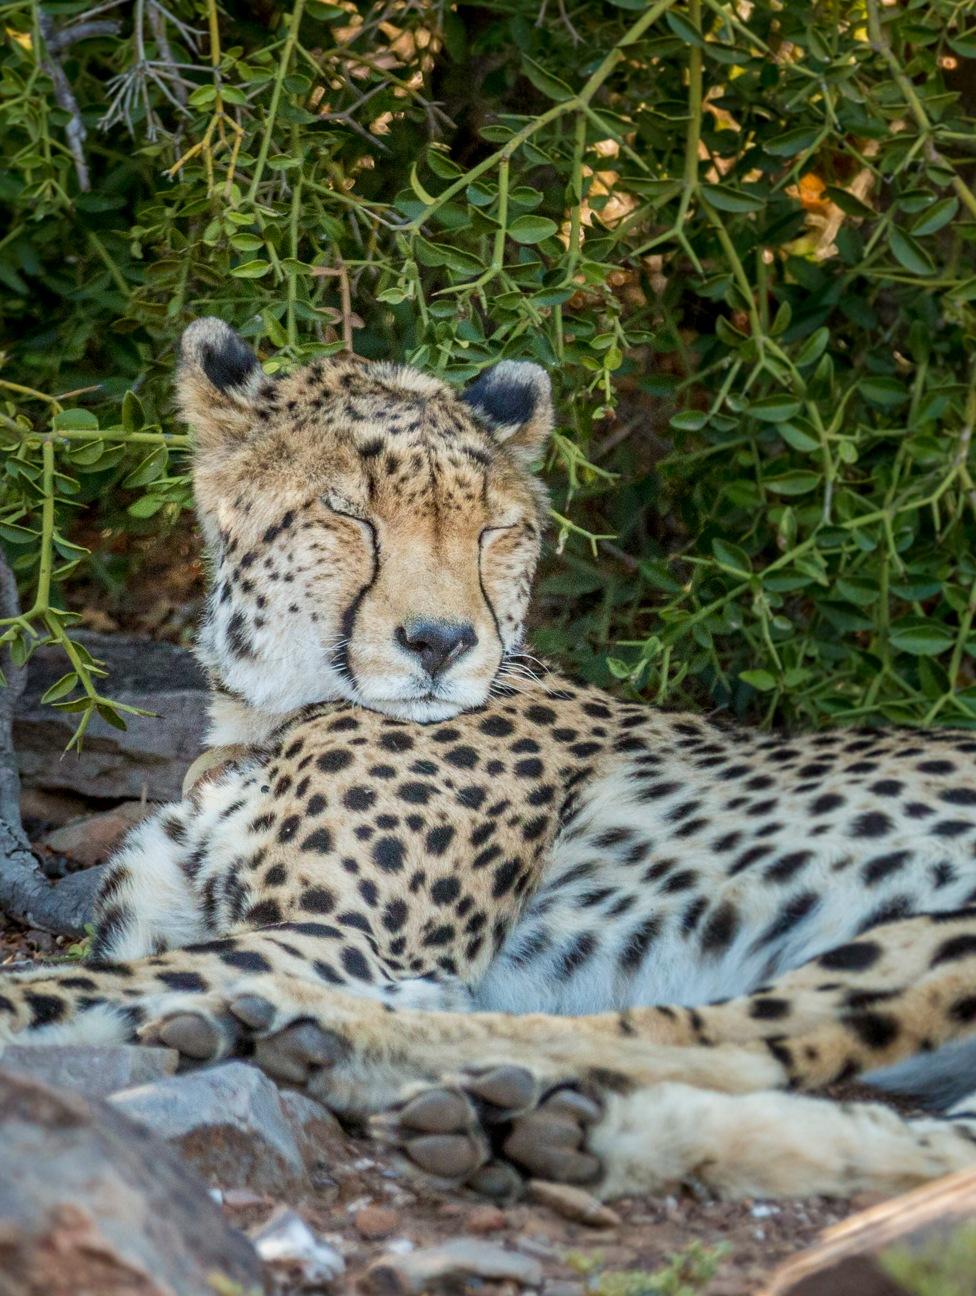 Cheetah in the shade by sdixon2380